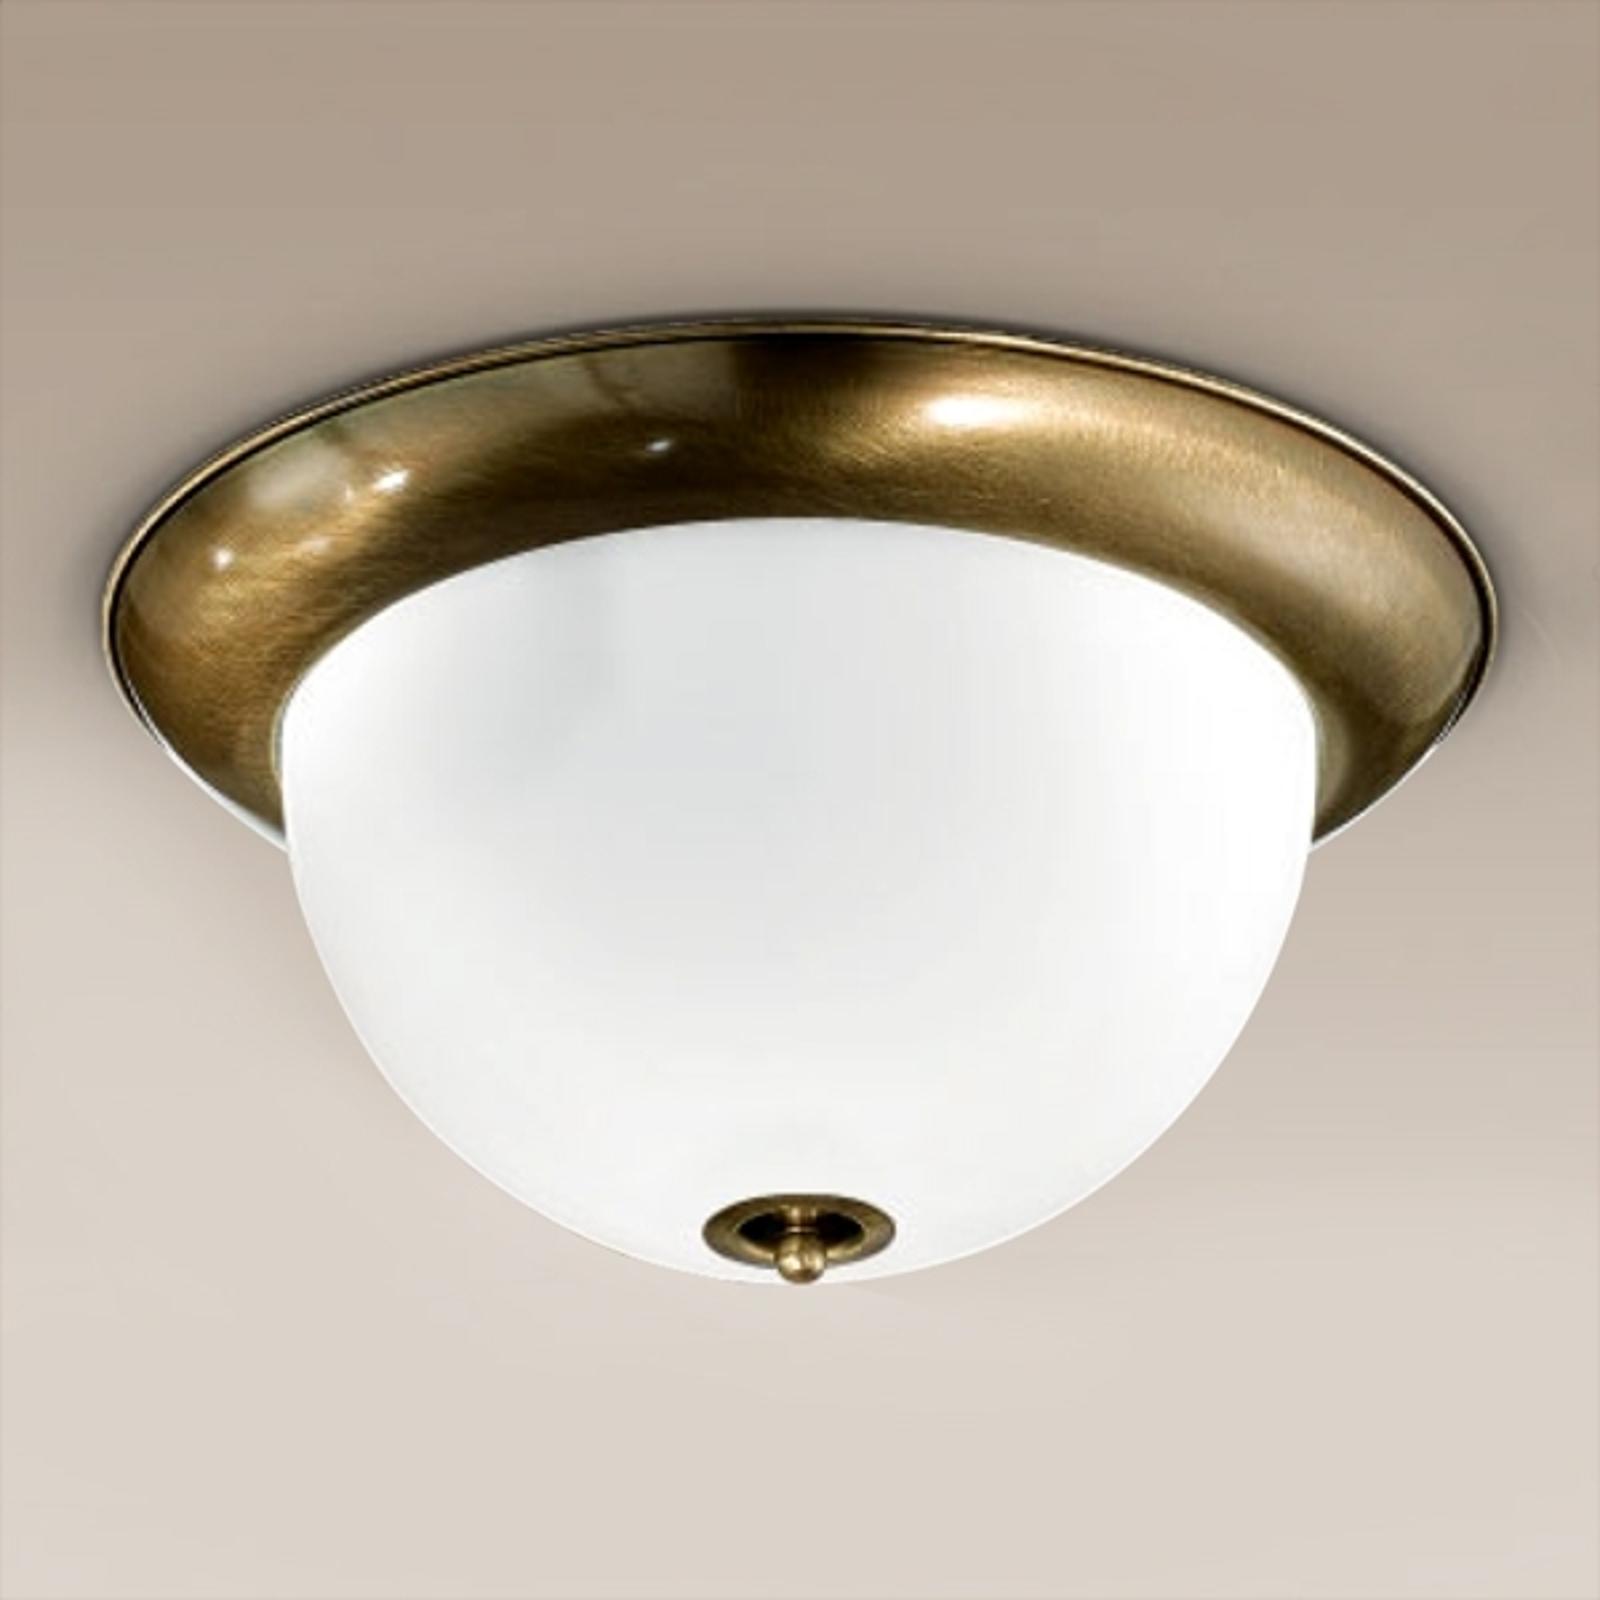 Klassisk Galleria loftlampe